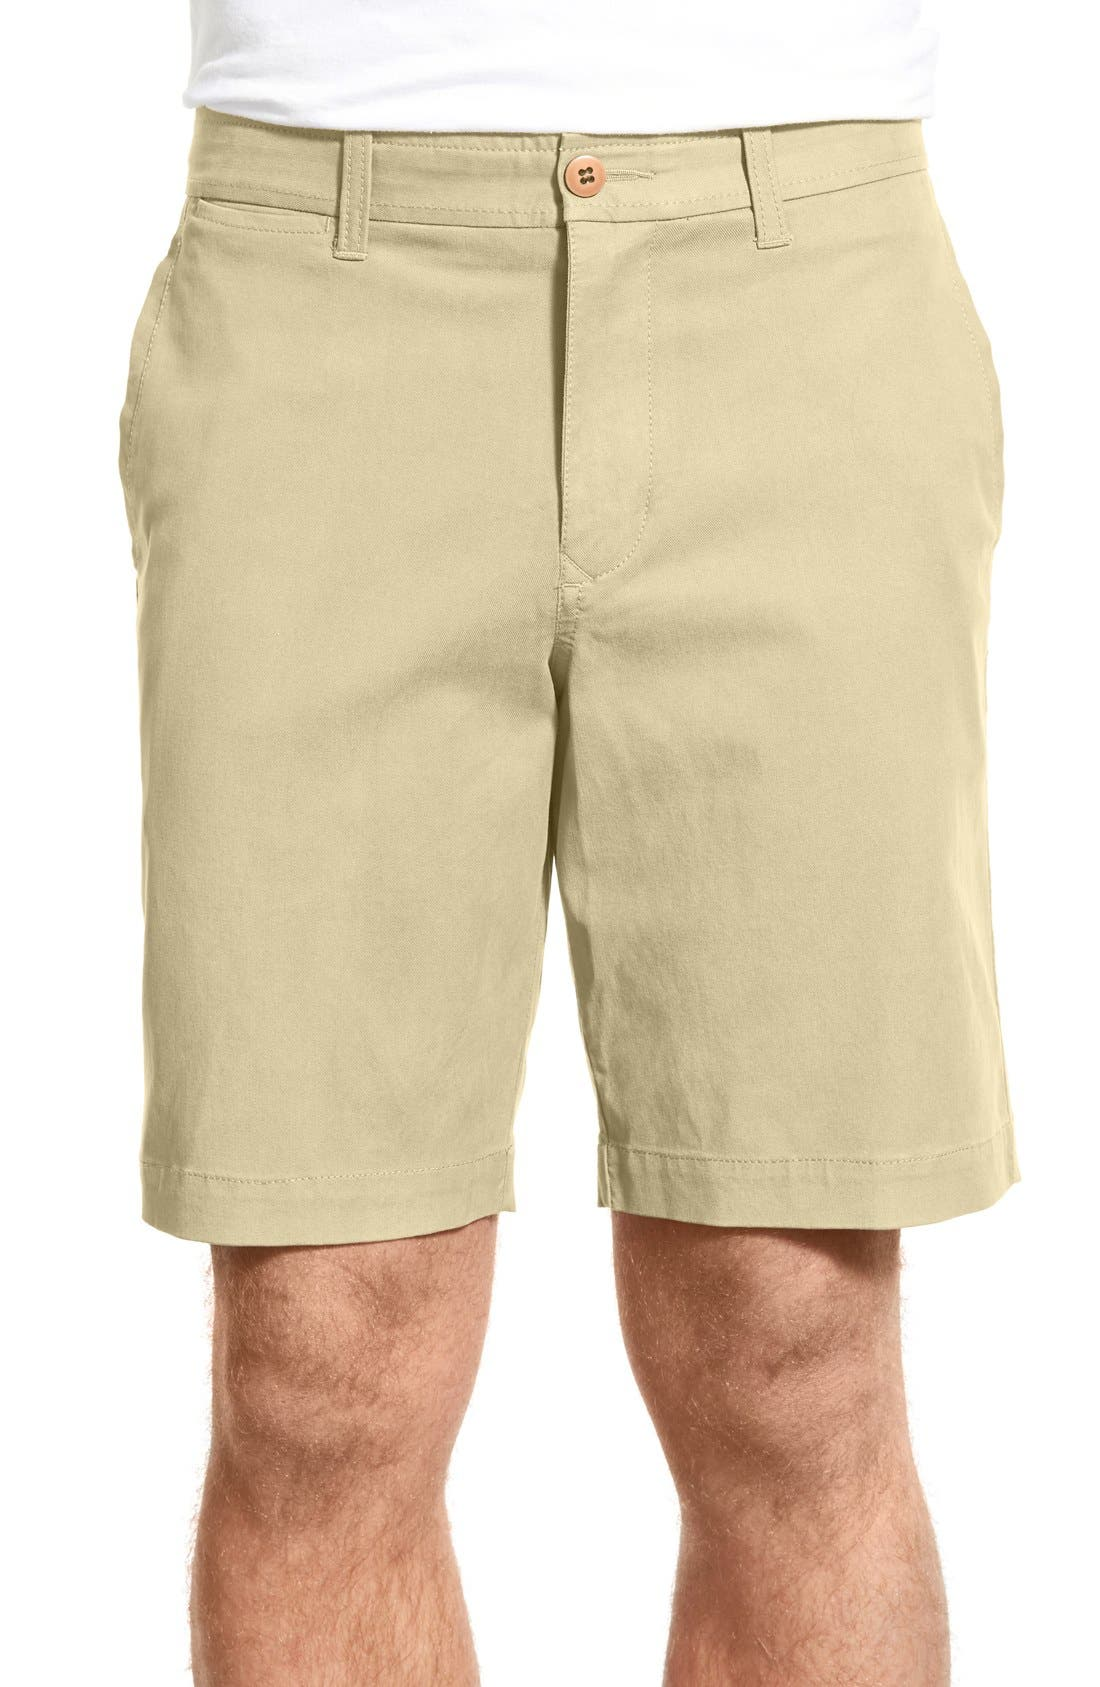 Main Image - Tommy Bahama 'Offshore' Flat Front Shorts